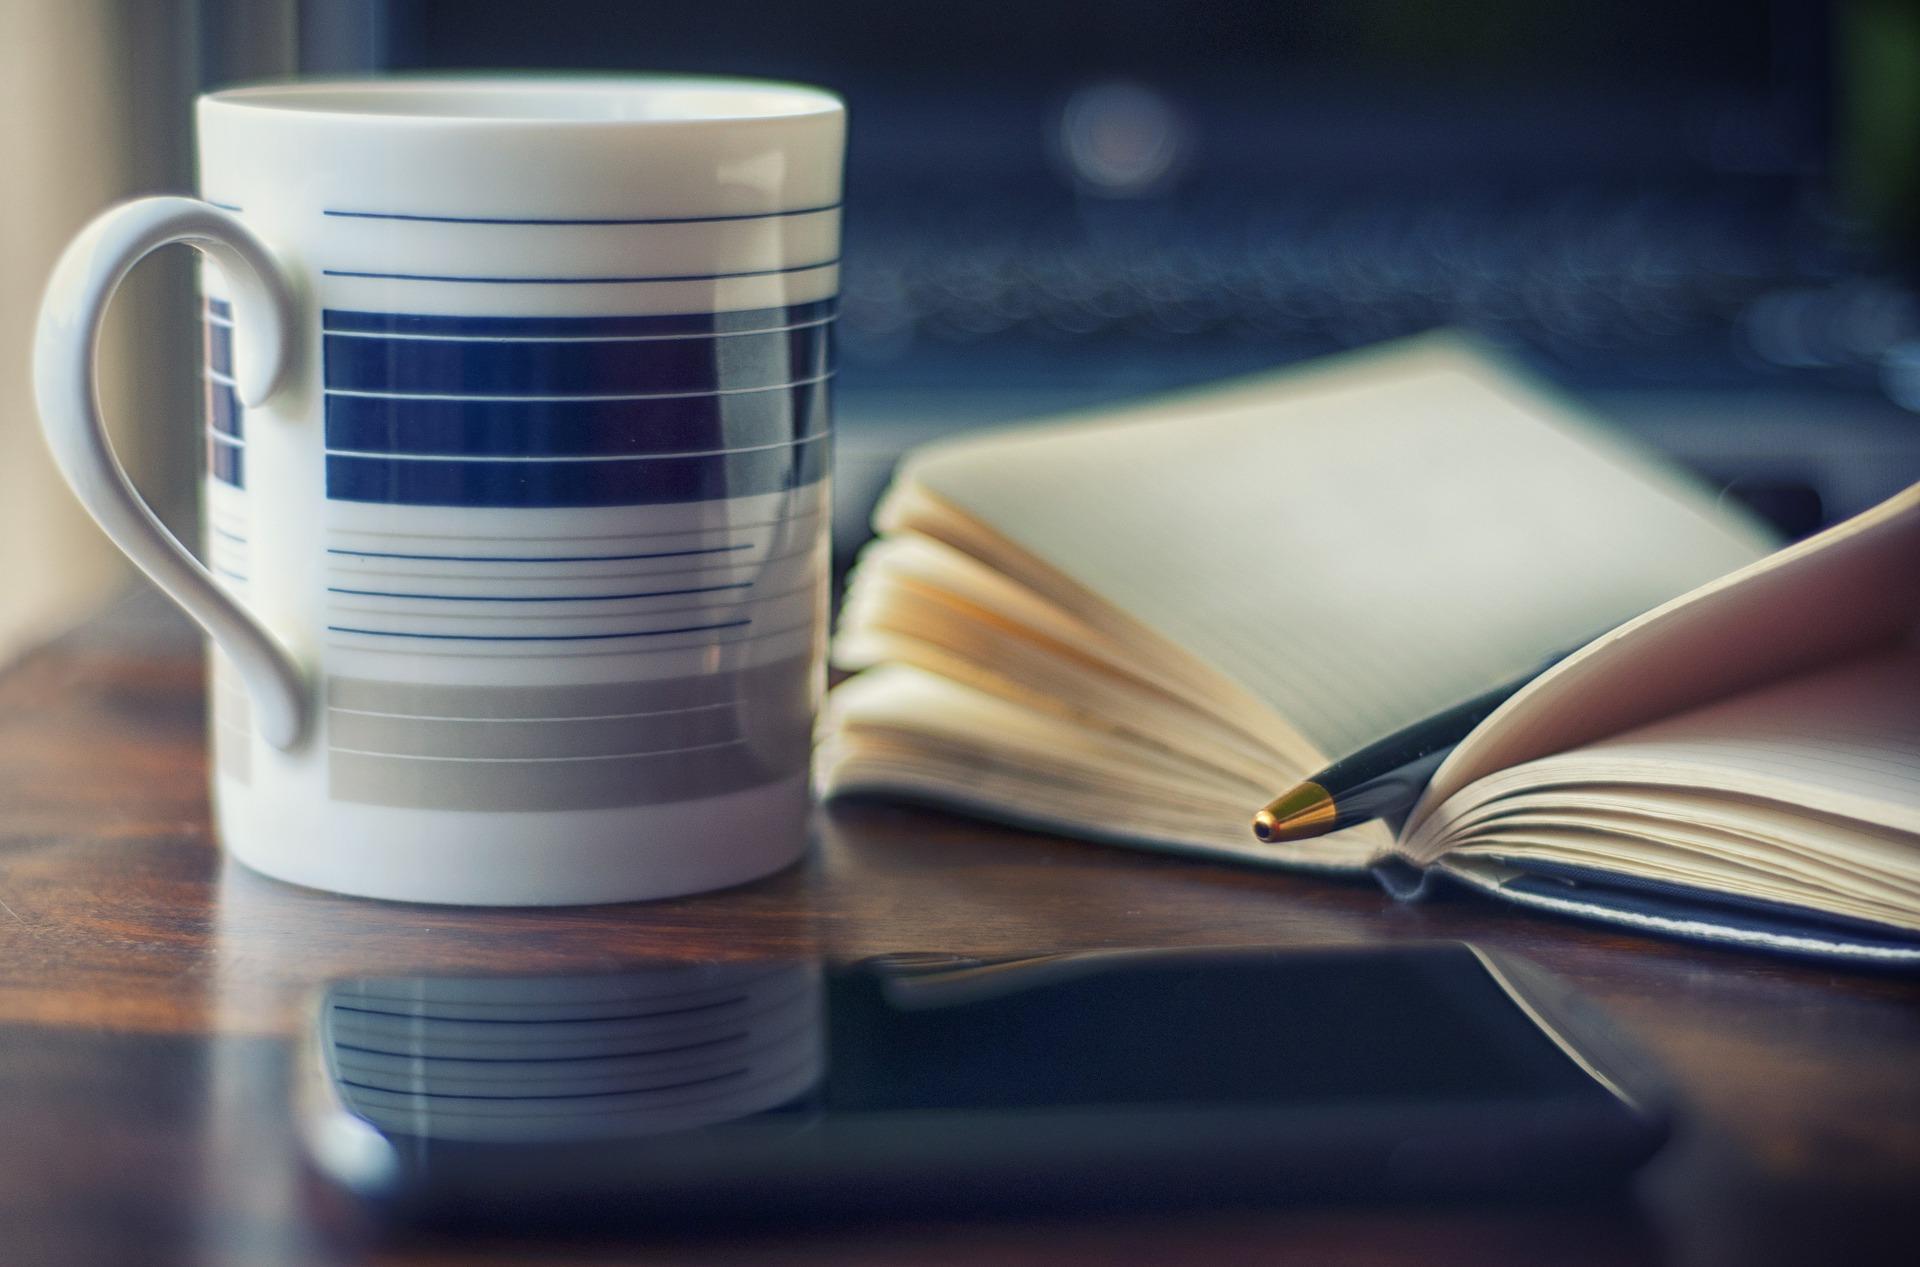 coffee-569178_1920.jpg